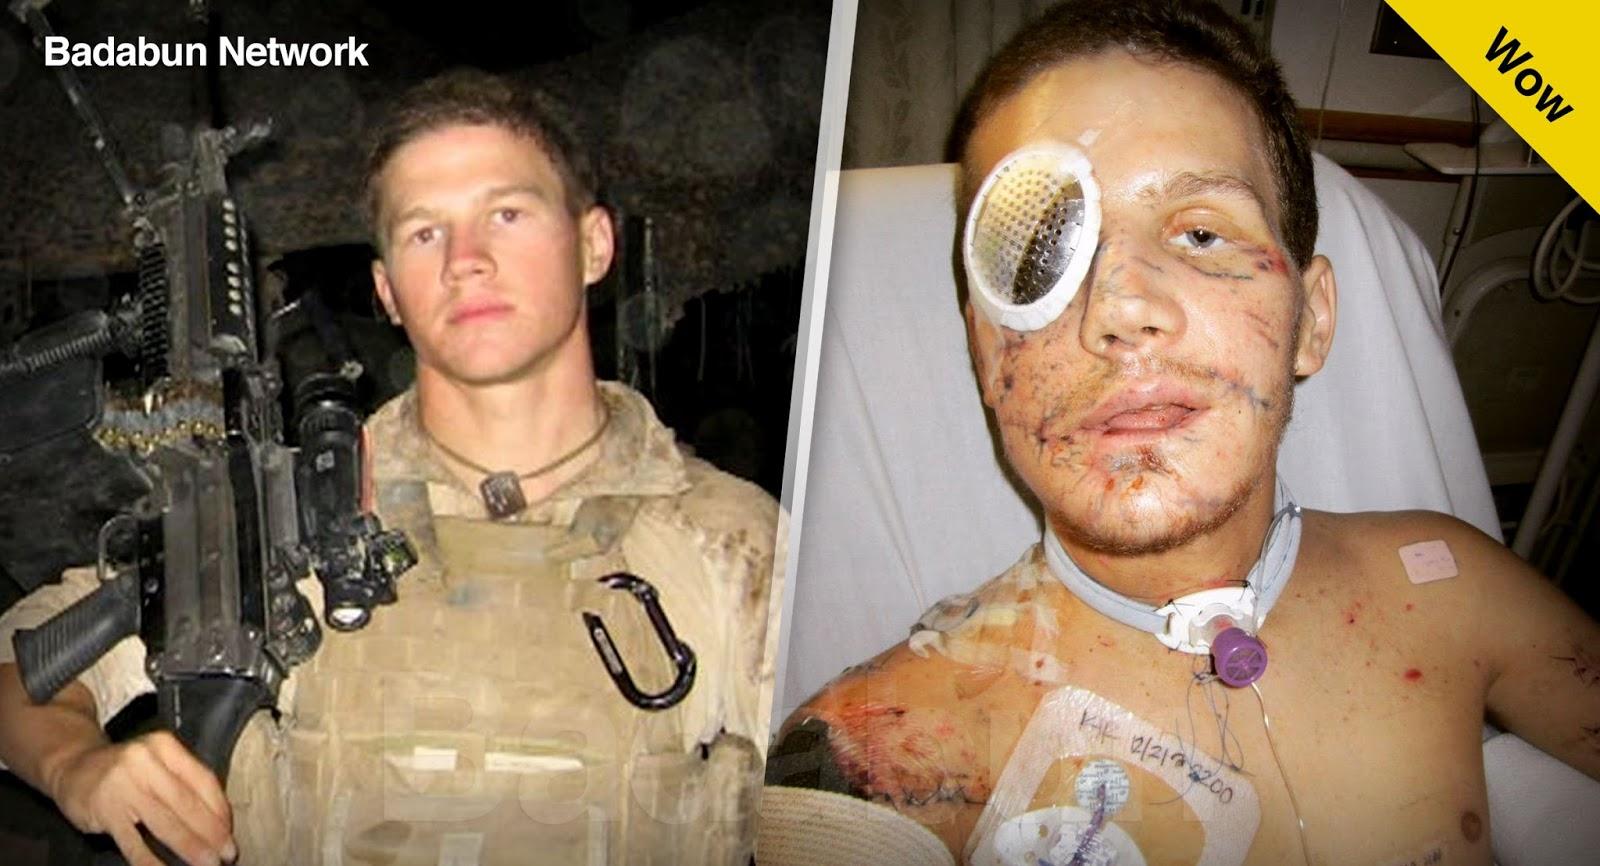 valiente soldado sacrifica salva amigo